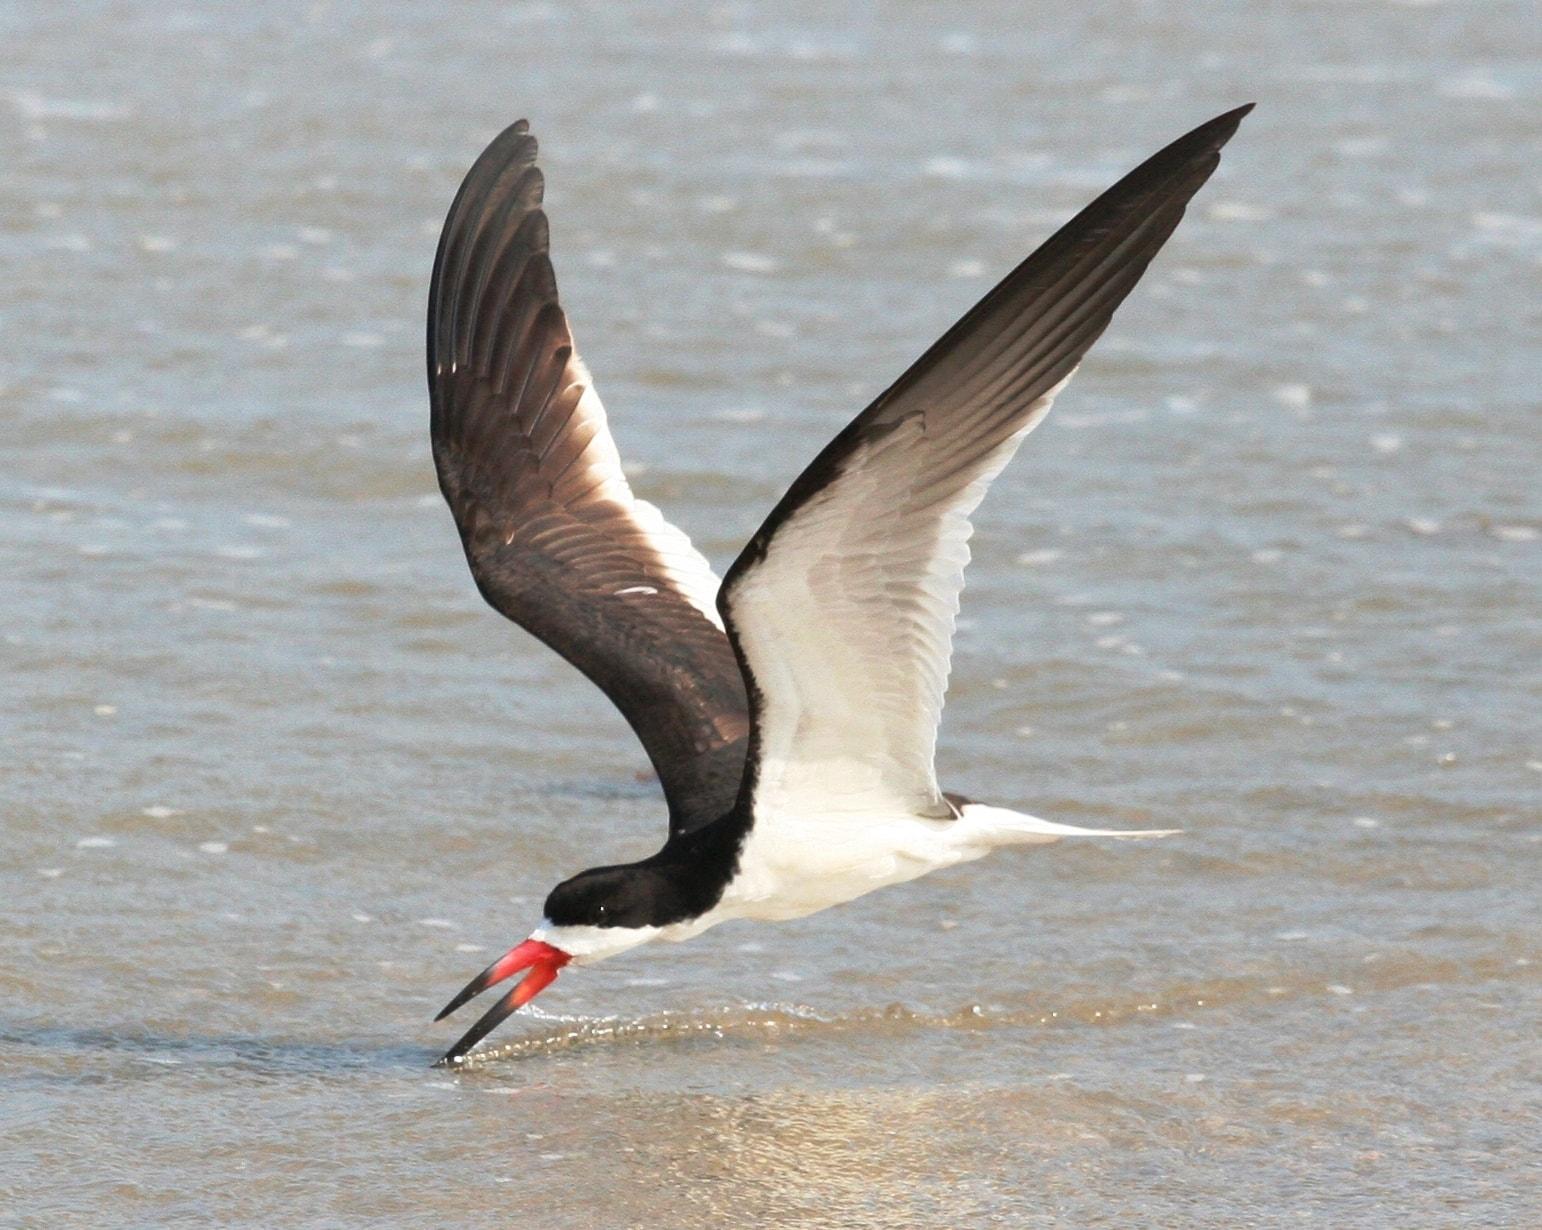 "<img src=""shorebird.jpg"" alt=""A black Skimmer gliding to get fish from water"">"